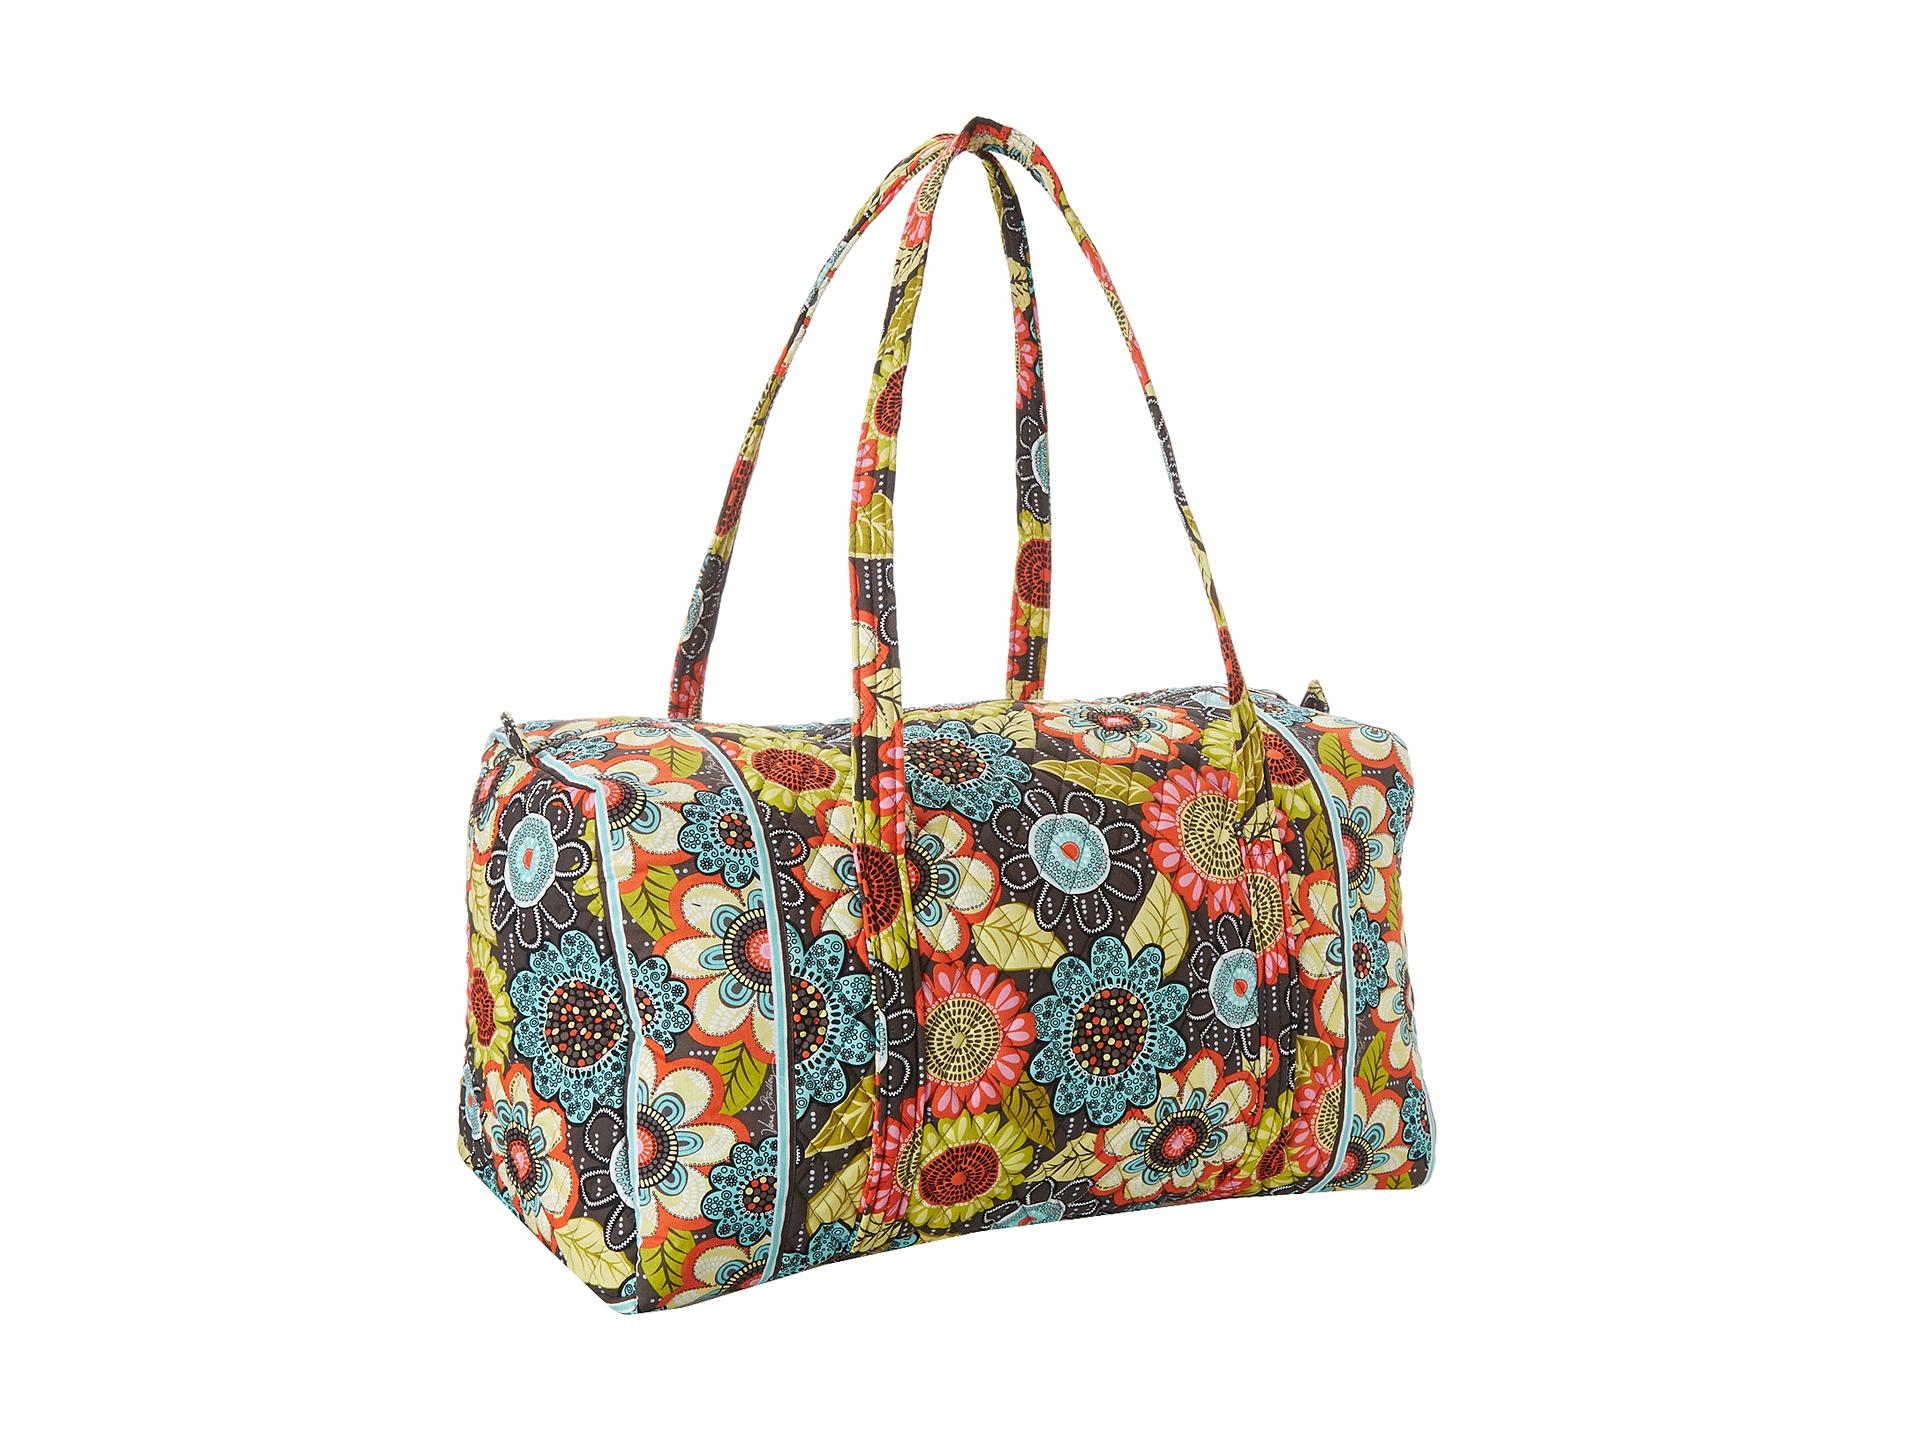 Vera bradley luggage large duffel flower shower zappos for Vera bradley bathroom bag